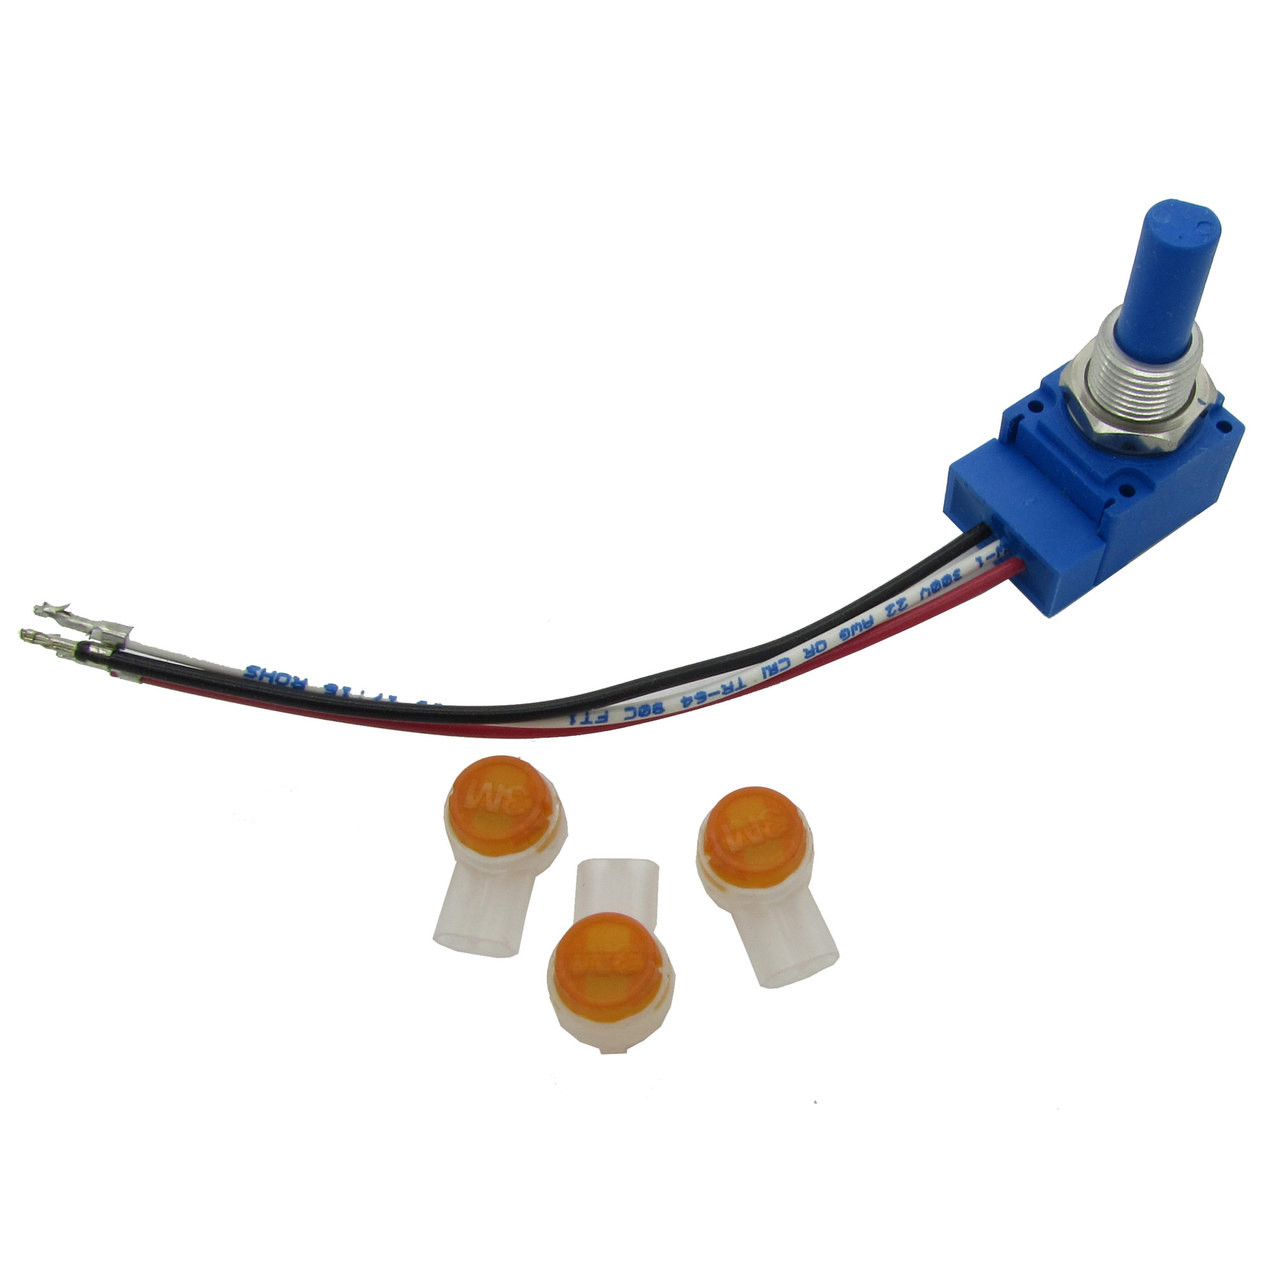 Minn Kota Trolling Motor Part Potentiometer 3m Connector